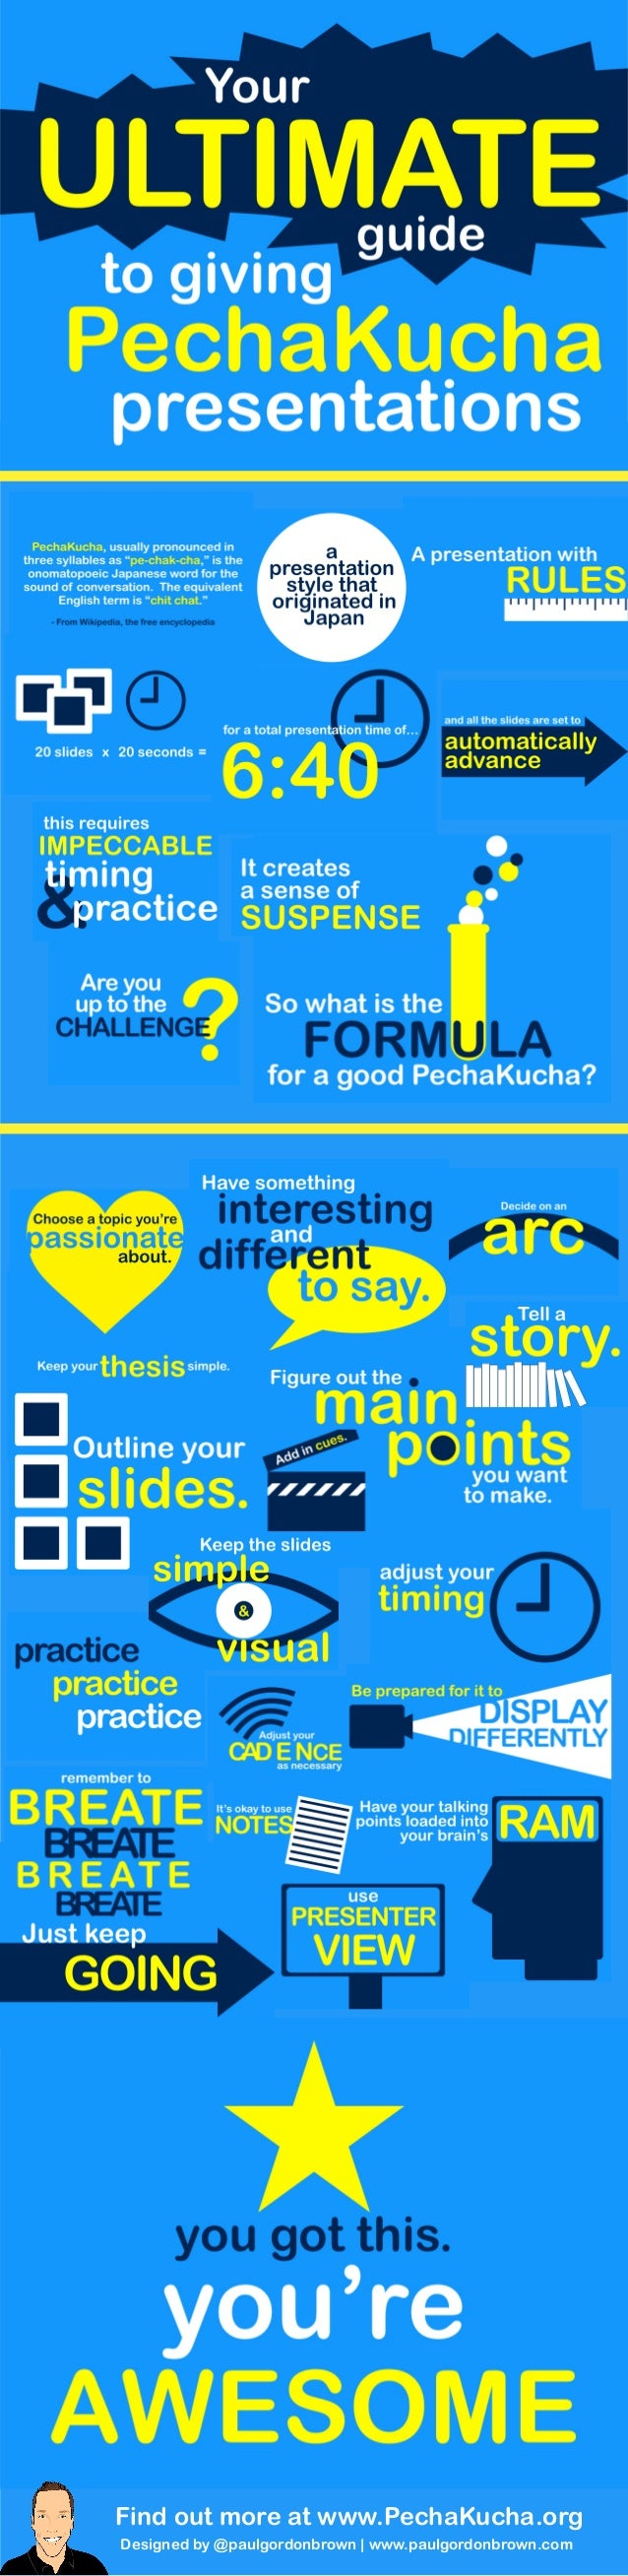 Find out more at www.PechaKucha.org  Designed by @paulgordonbrown | www.paulgordonbrown.com